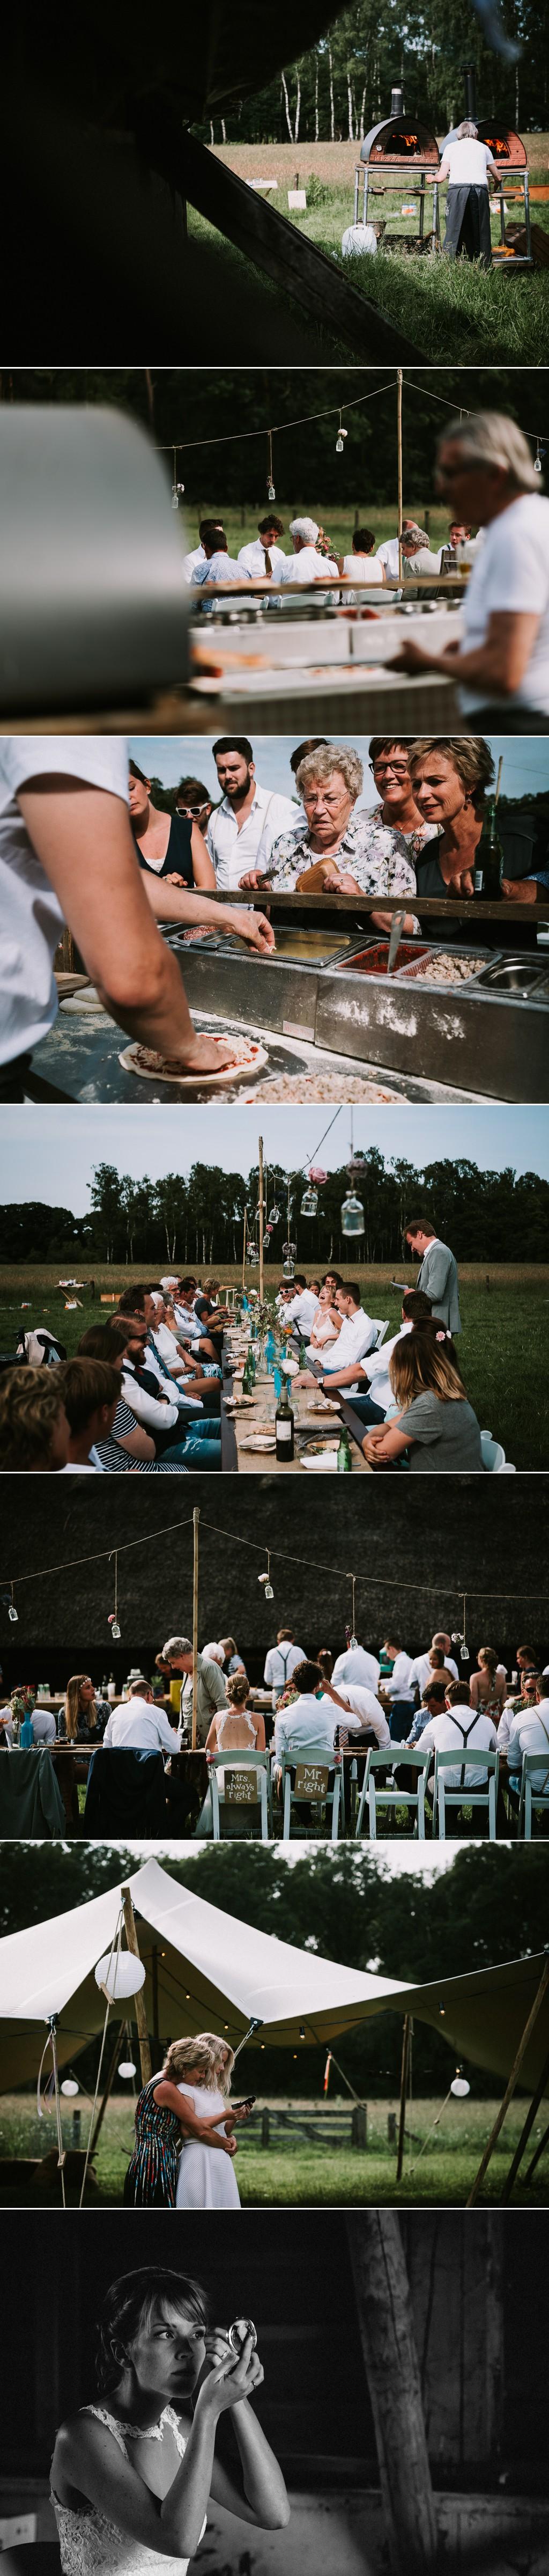 trouwfotograaf-rotterdam-trouwen-in-het-bos-arnhem-fotografie-steef-utama-w-w-09